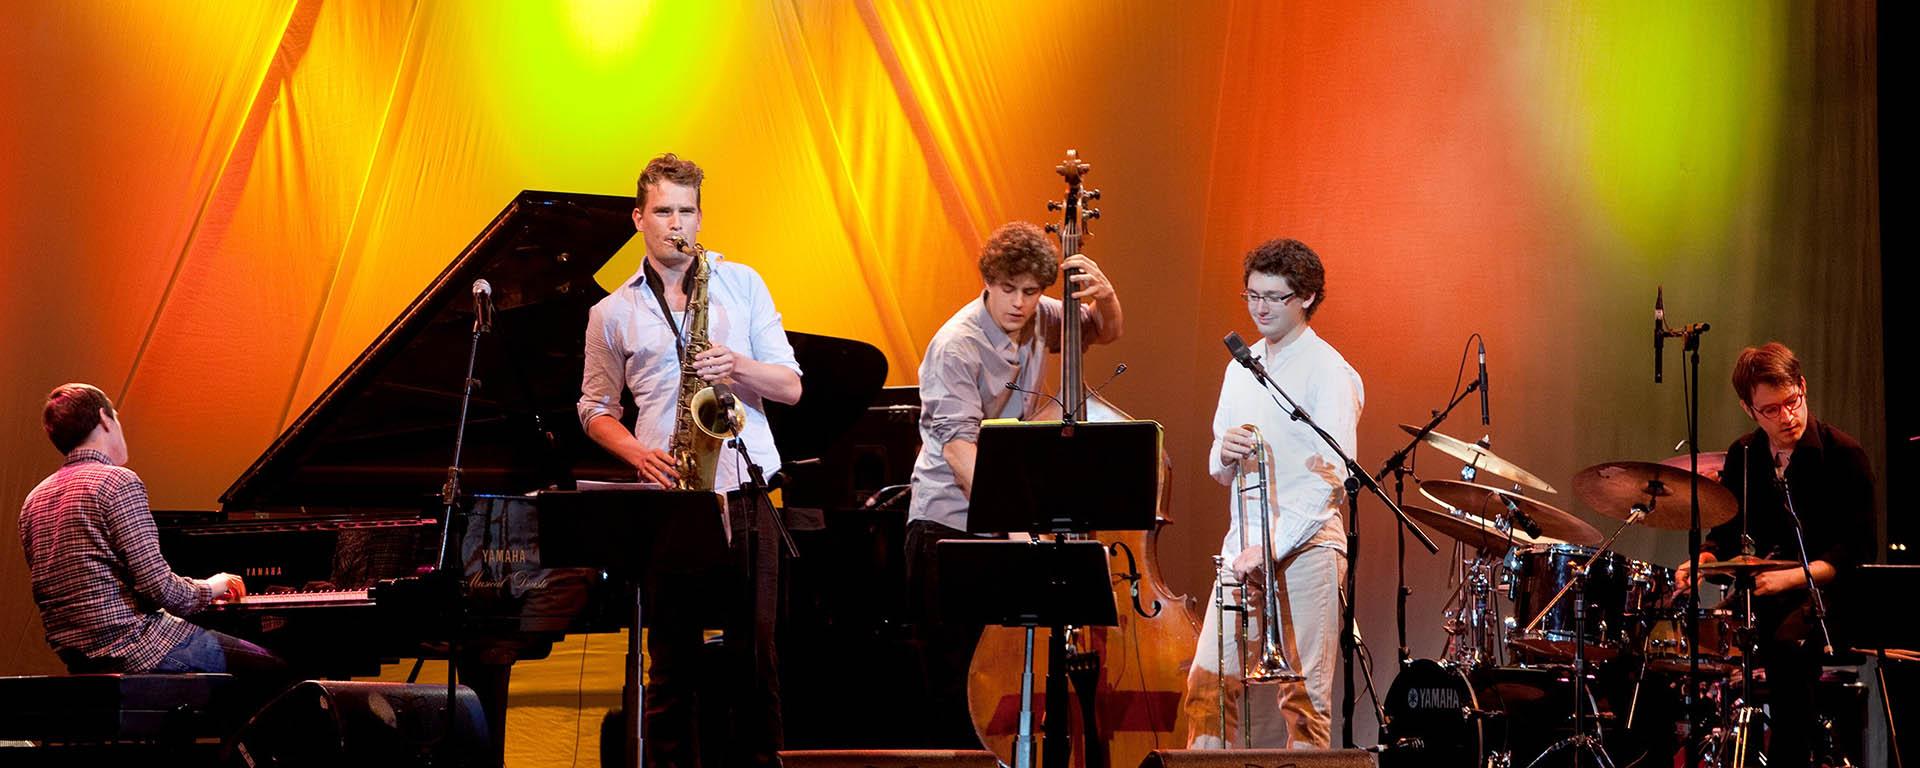 Tobias Meinhart Quintet